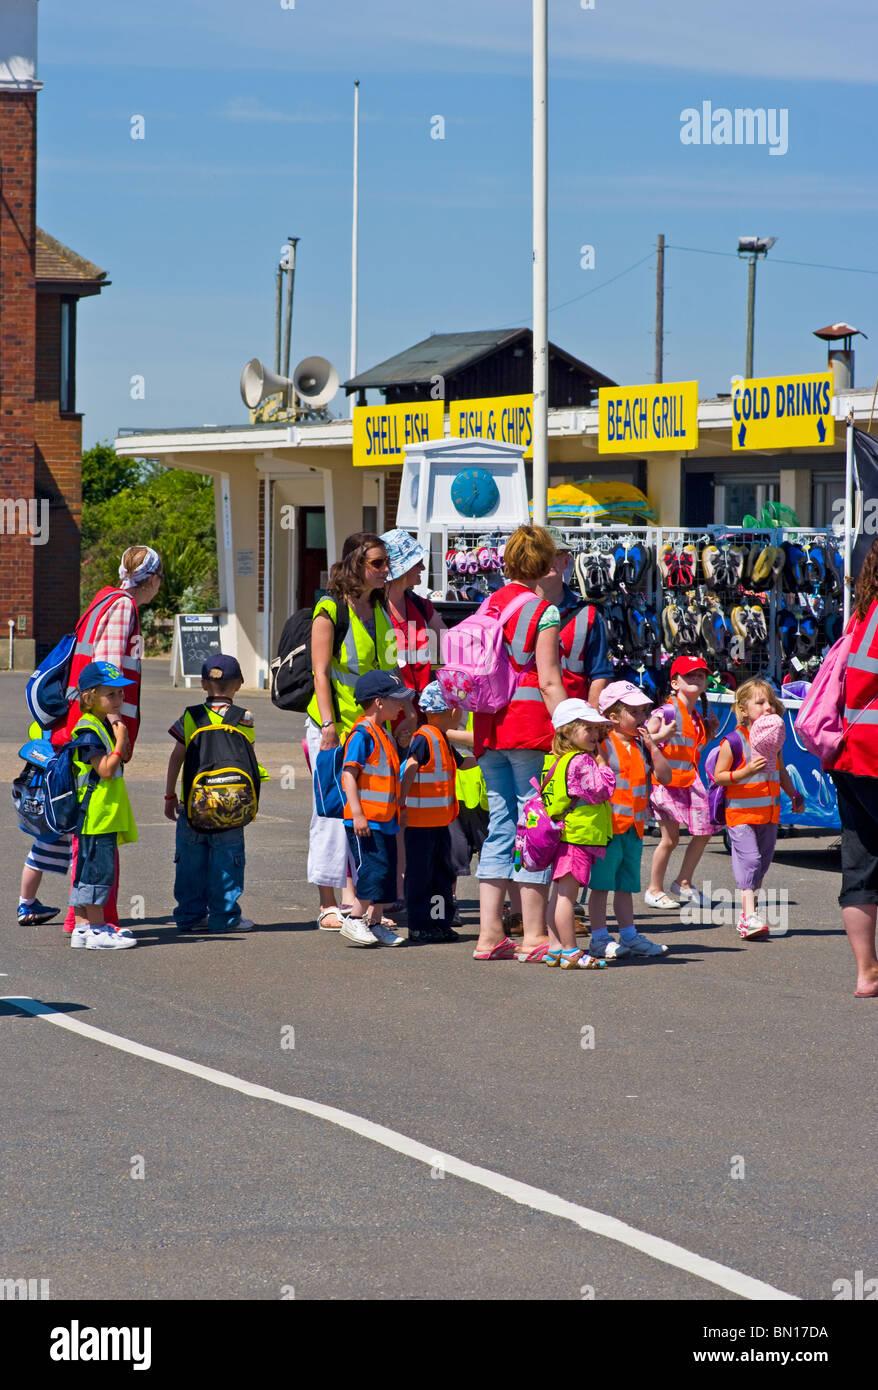 Schoolchildren On A Day Trip To Littlehampton West Sussex England - Stock Image